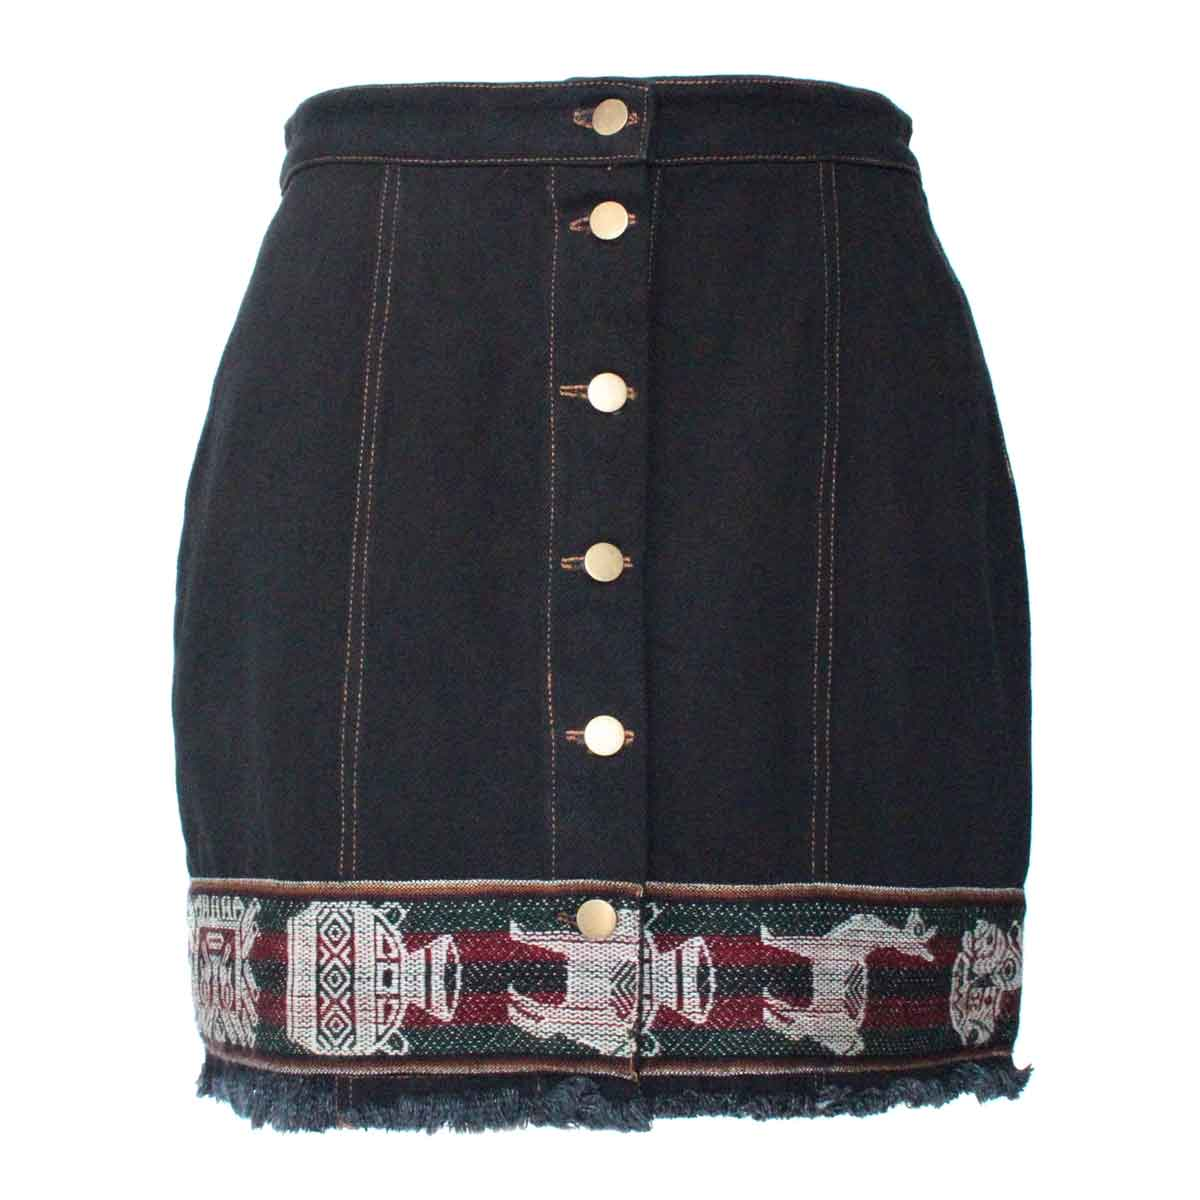 Inka-Products-Mini-jupe Femme Denim Noir-Tissu Traditionnel Andin Bordeaux